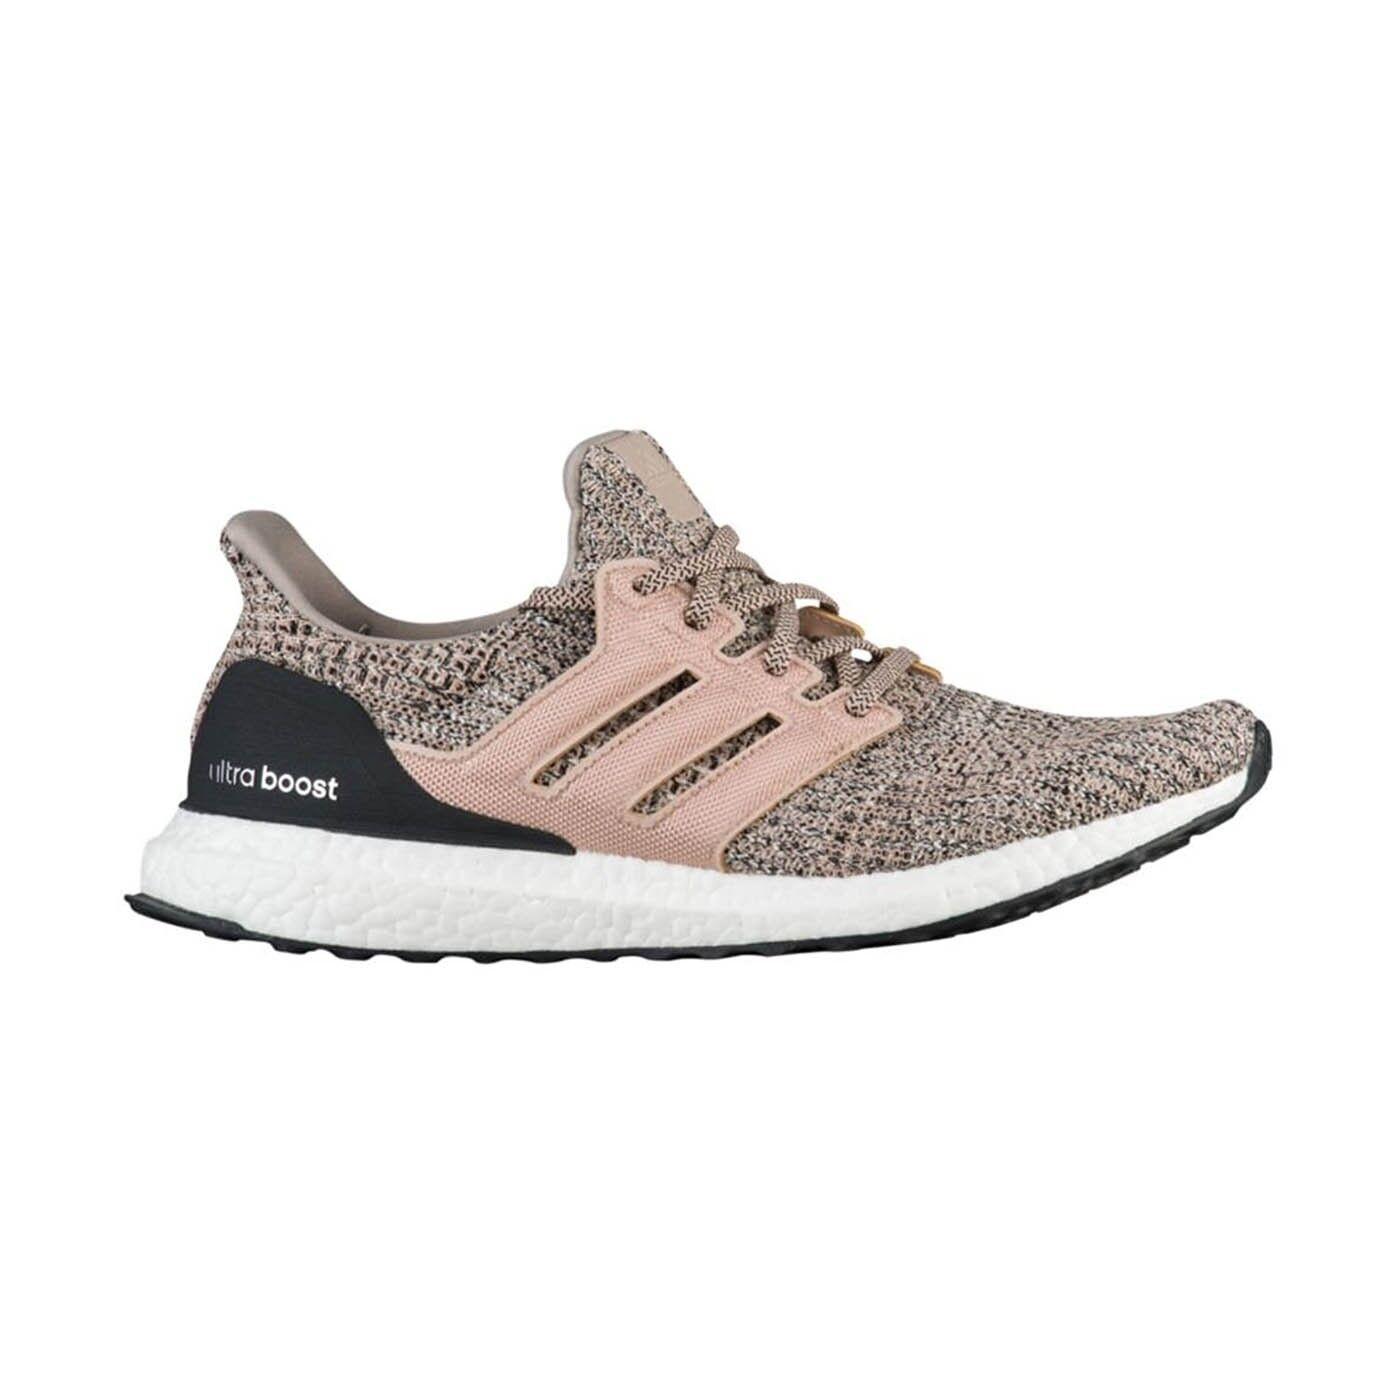 Adidas Ultraboost In Ash Pearl Core Black Mens Sneakers BB6174